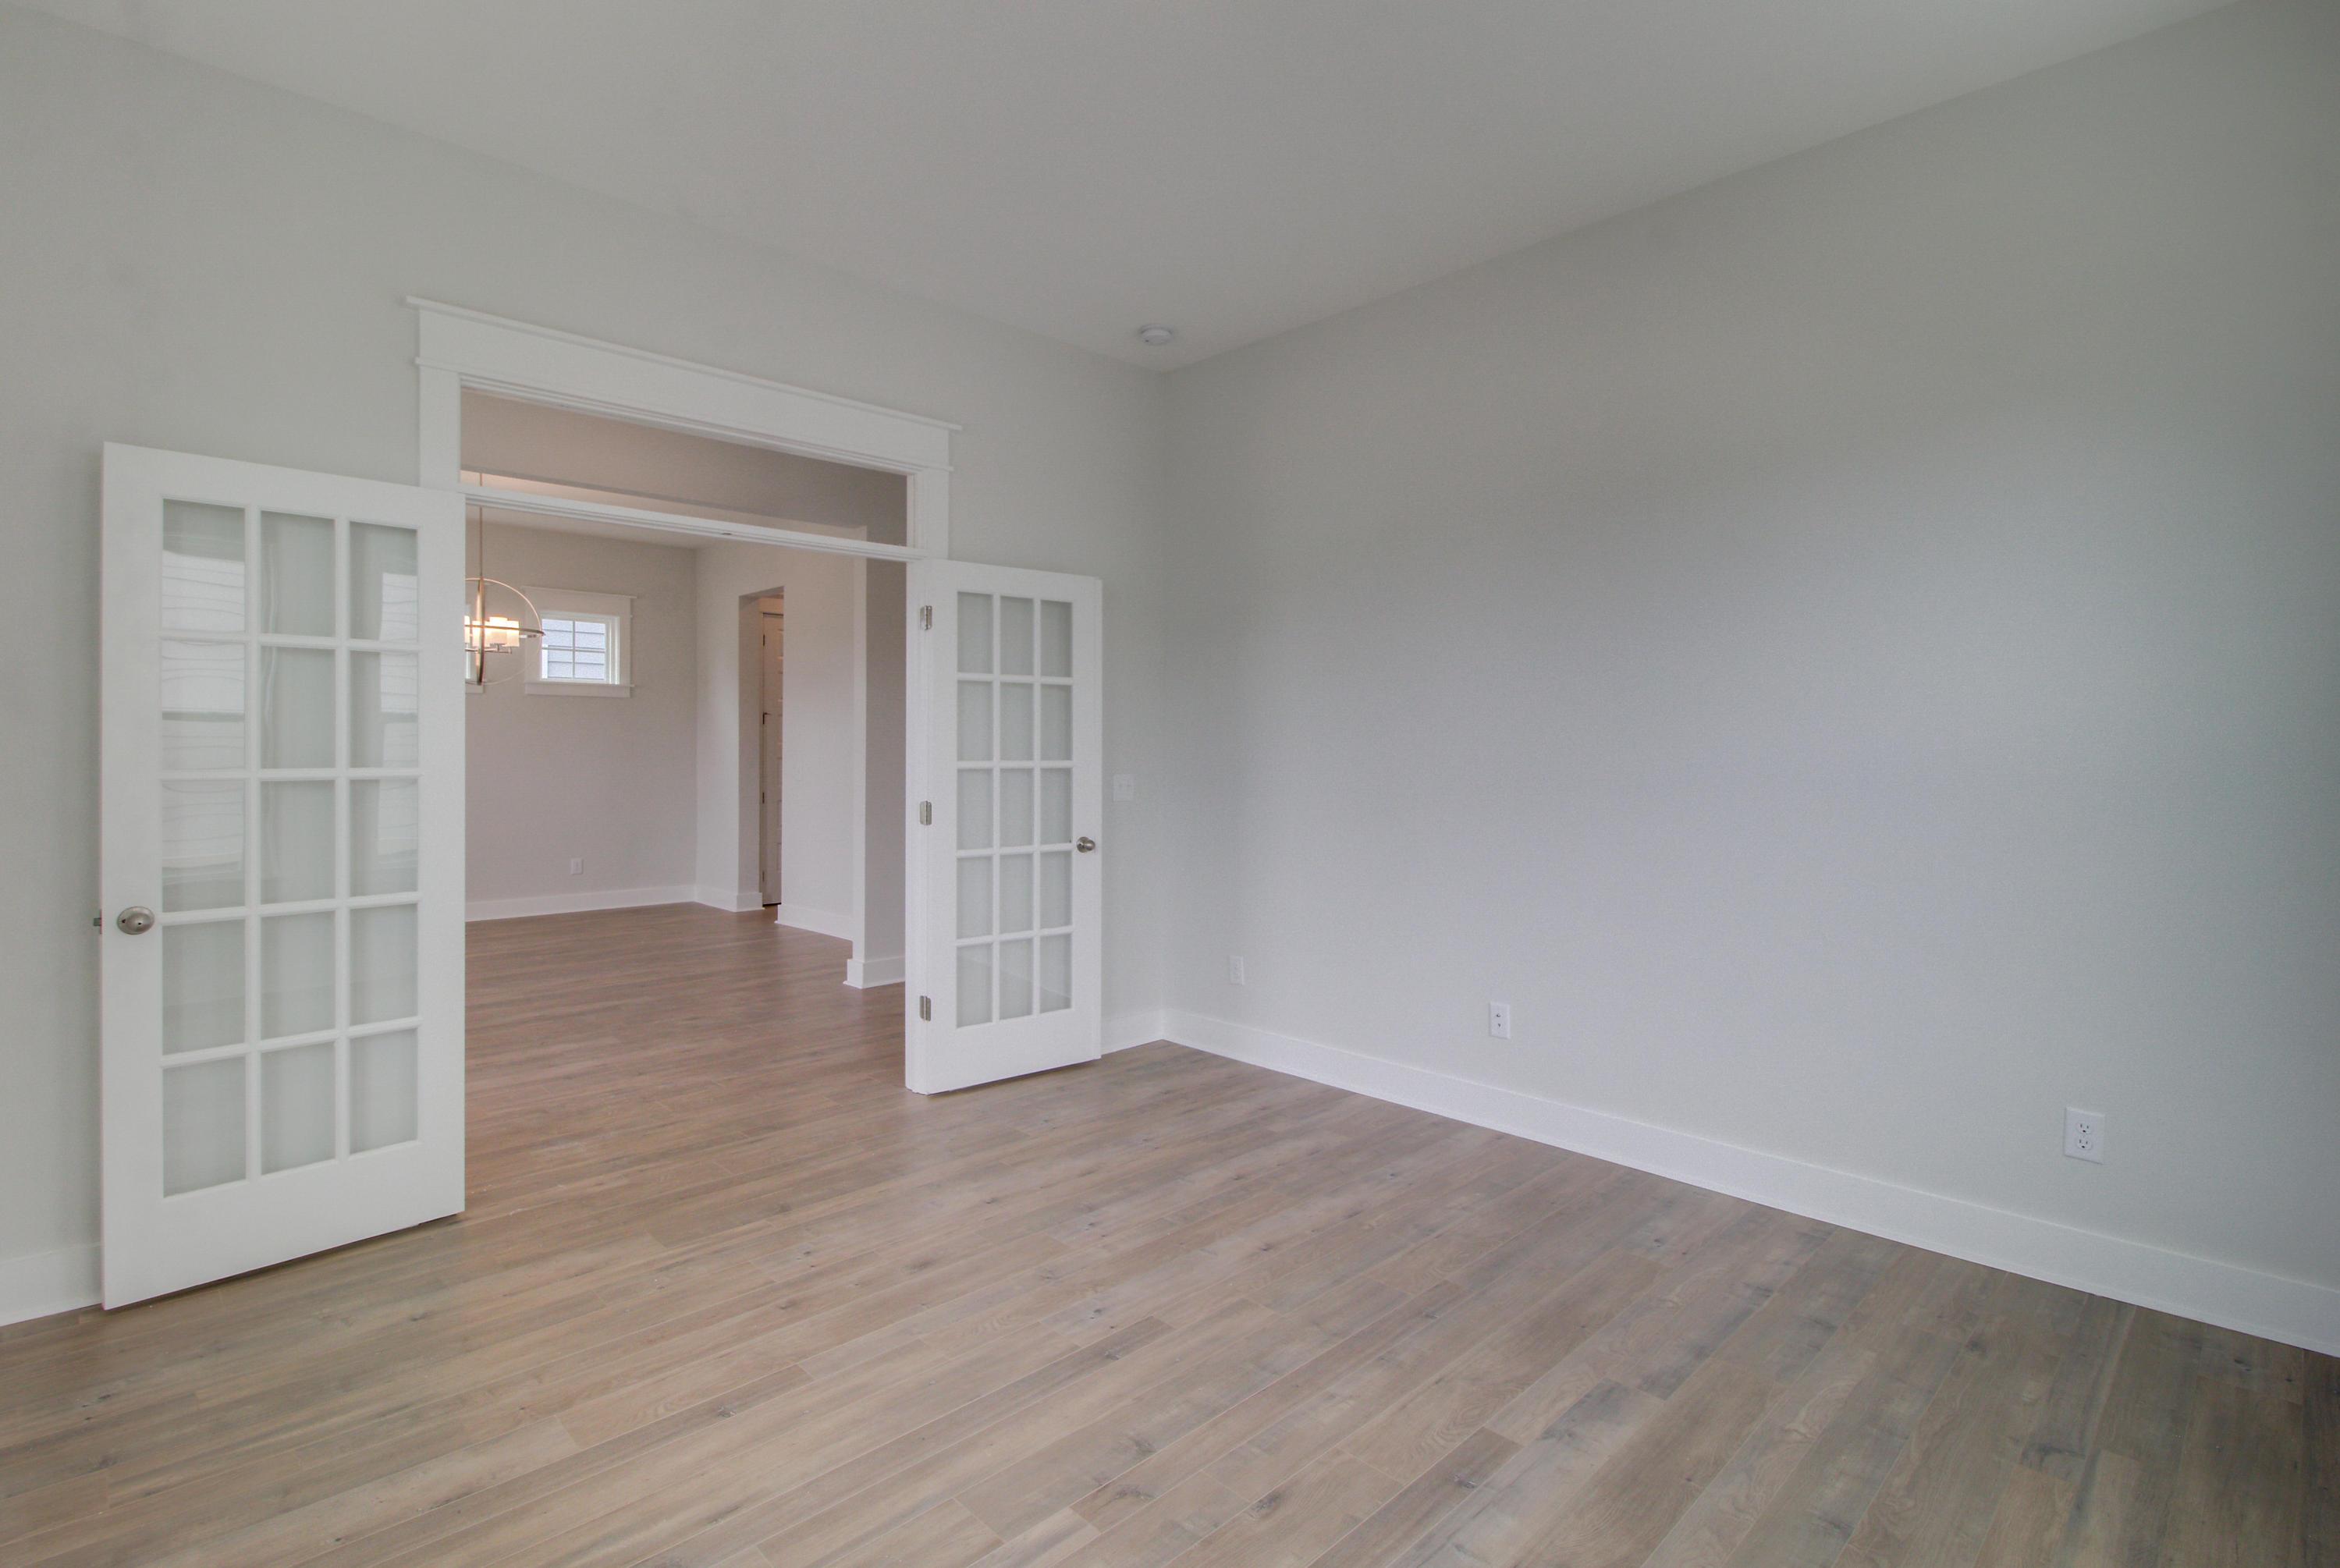 Carolina Park Homes For Sale - 1820 Agate Bay, Mount Pleasant, SC - 9